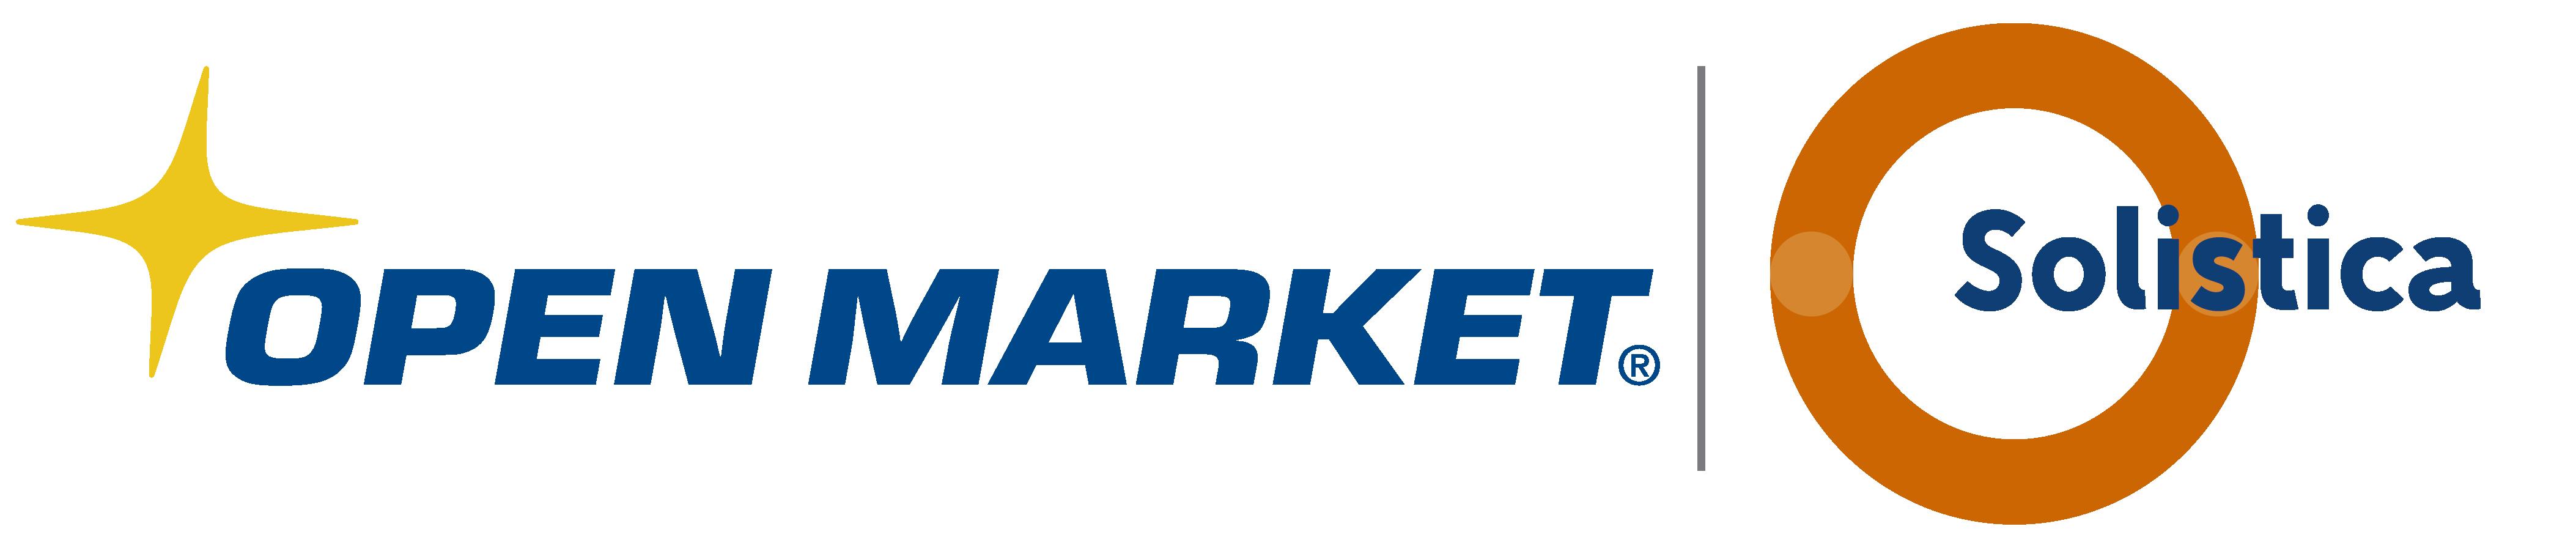 Open Market Ltda.